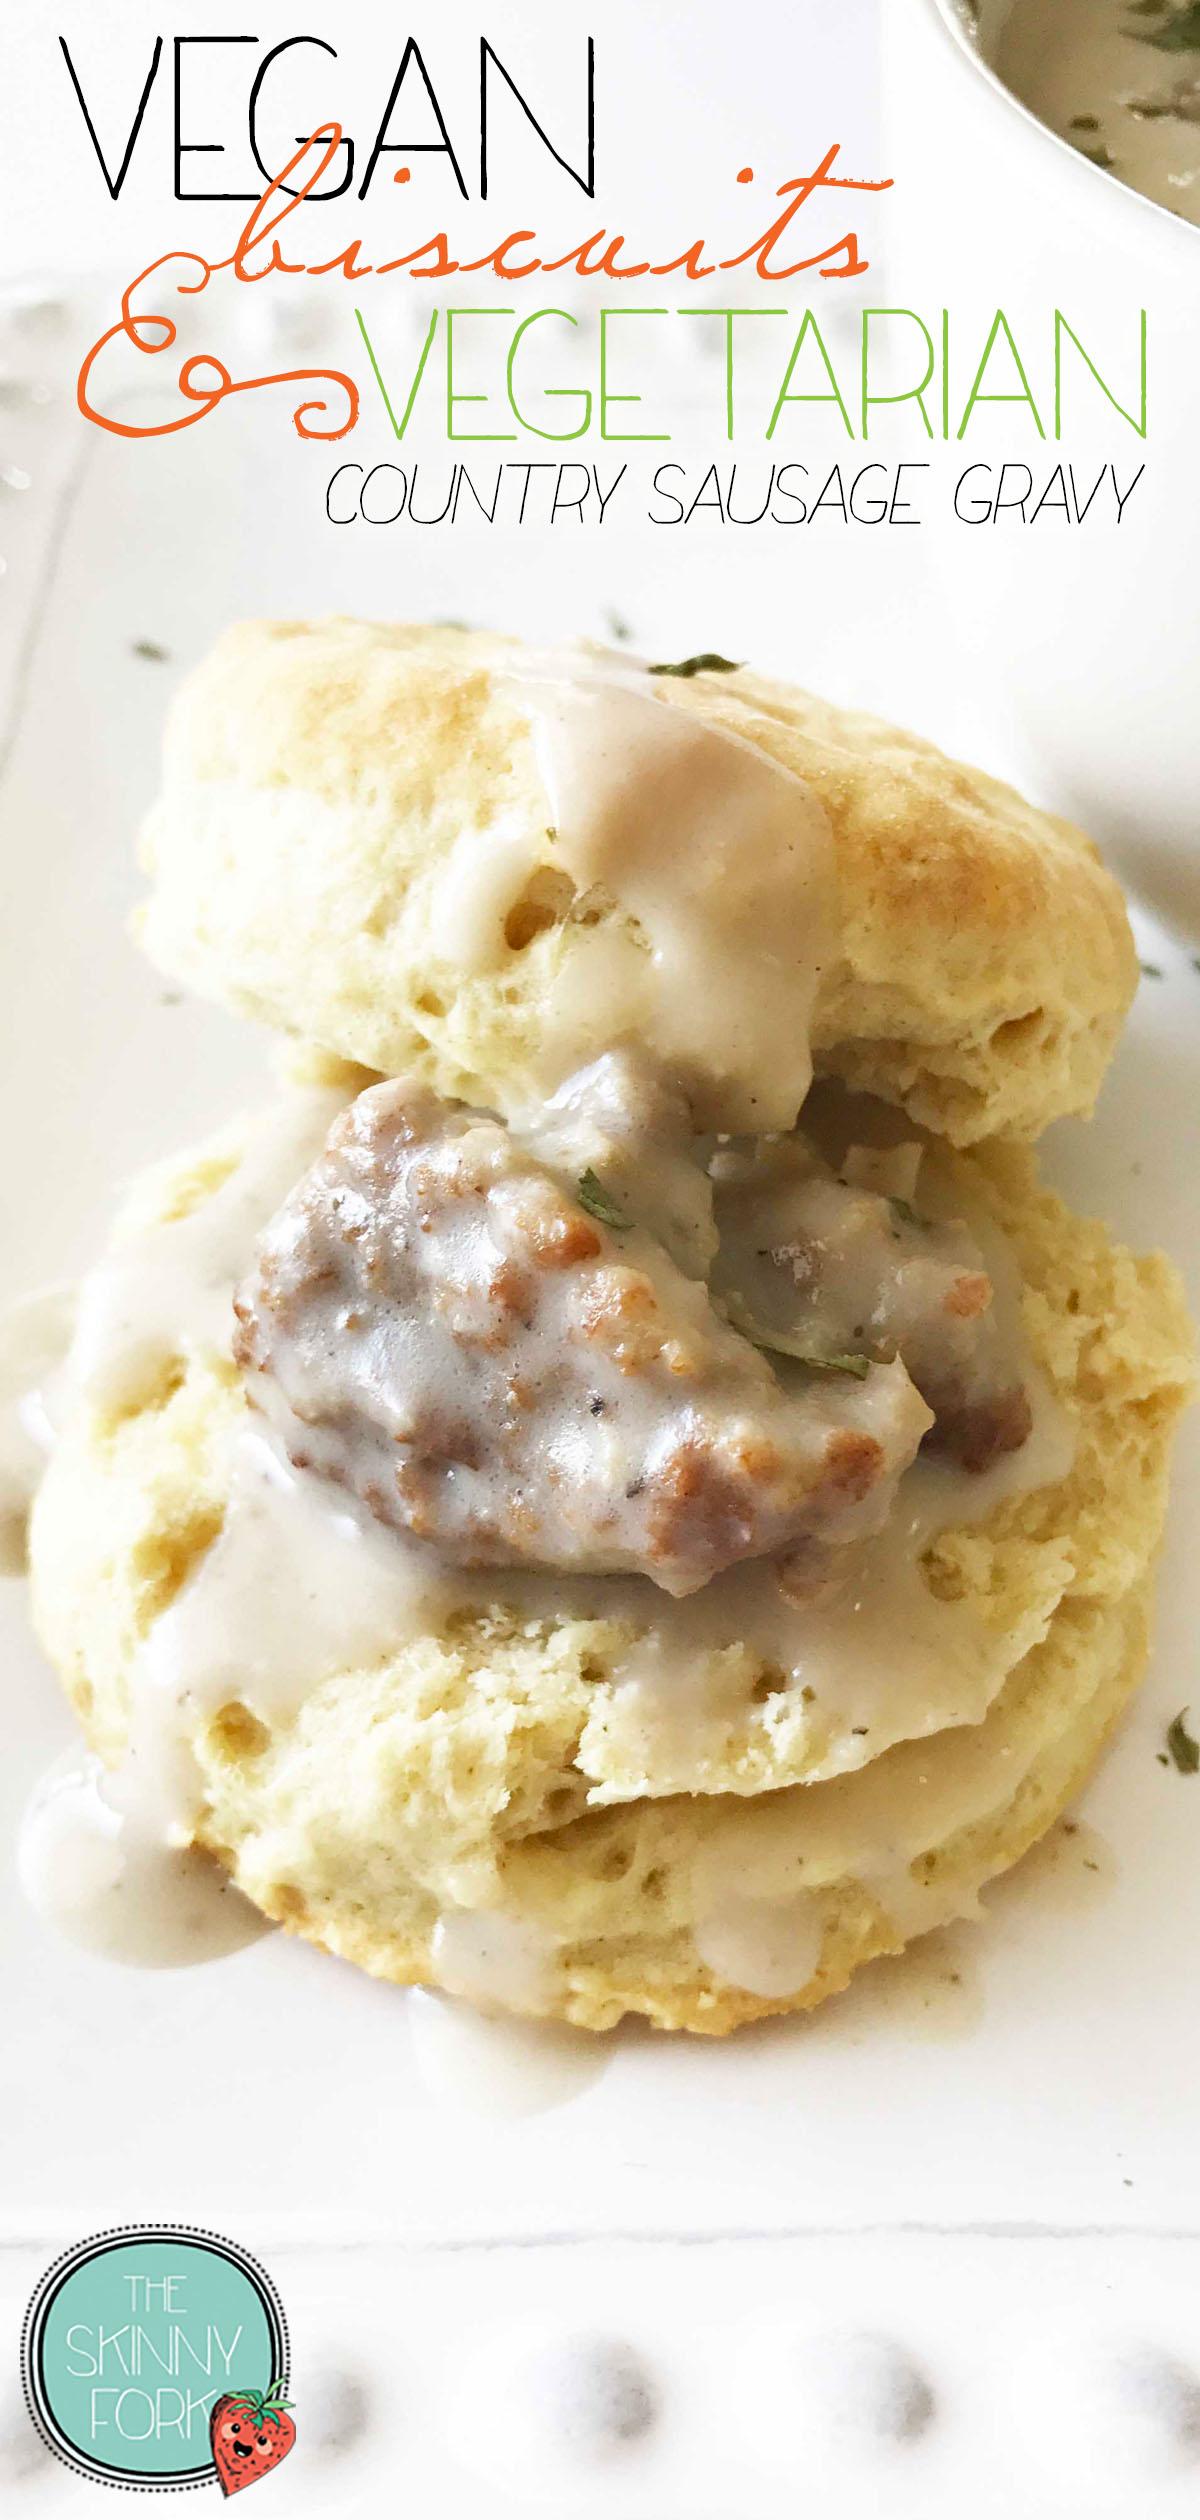 vegan-biscuits-gravy-pin.jpg